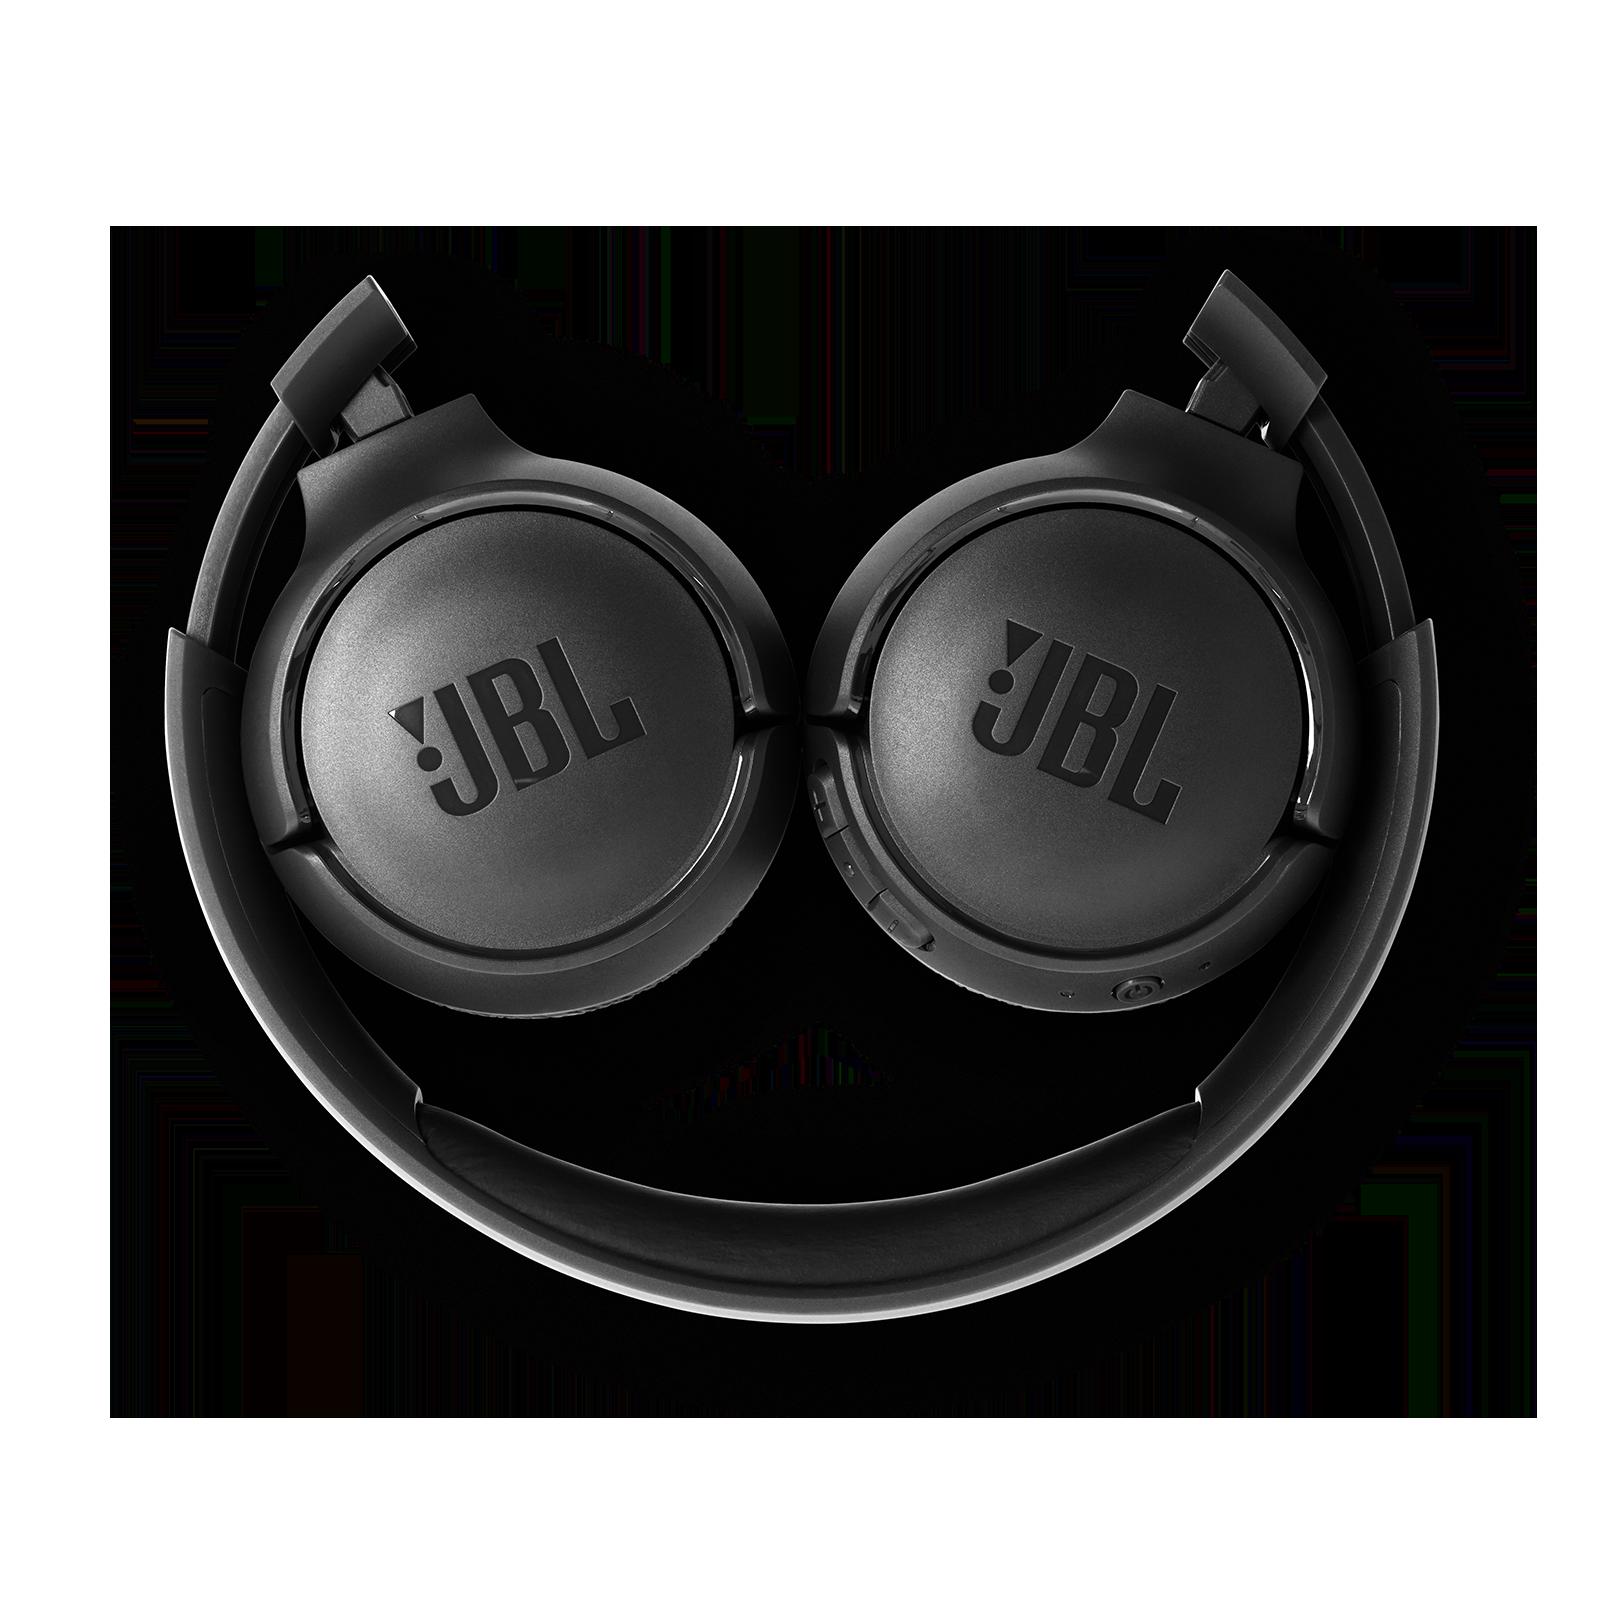 jbl casque bt500 charger